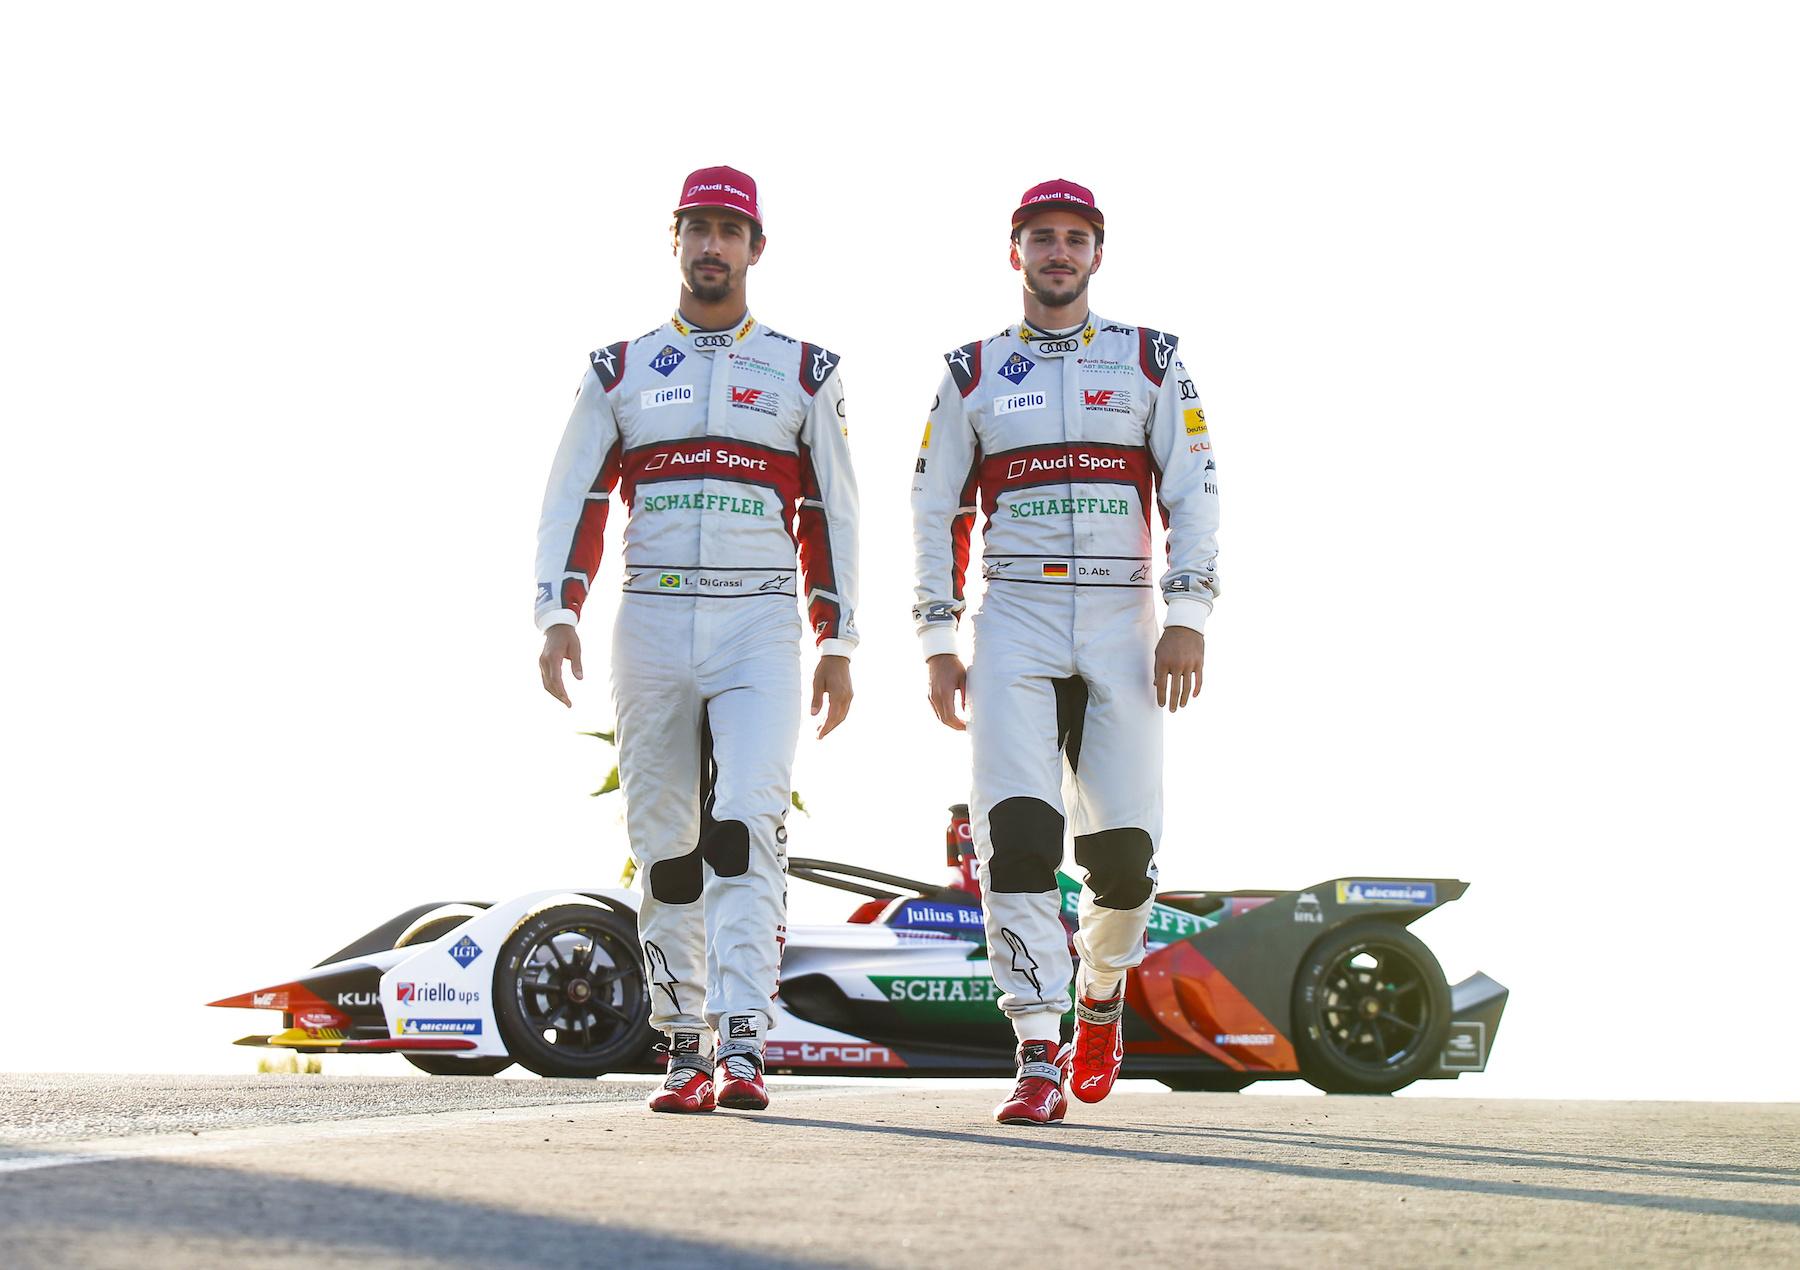 Lucas di Grassi (links) und Daniel Abt vor dem Audi e-tron FE05. (AUDI)